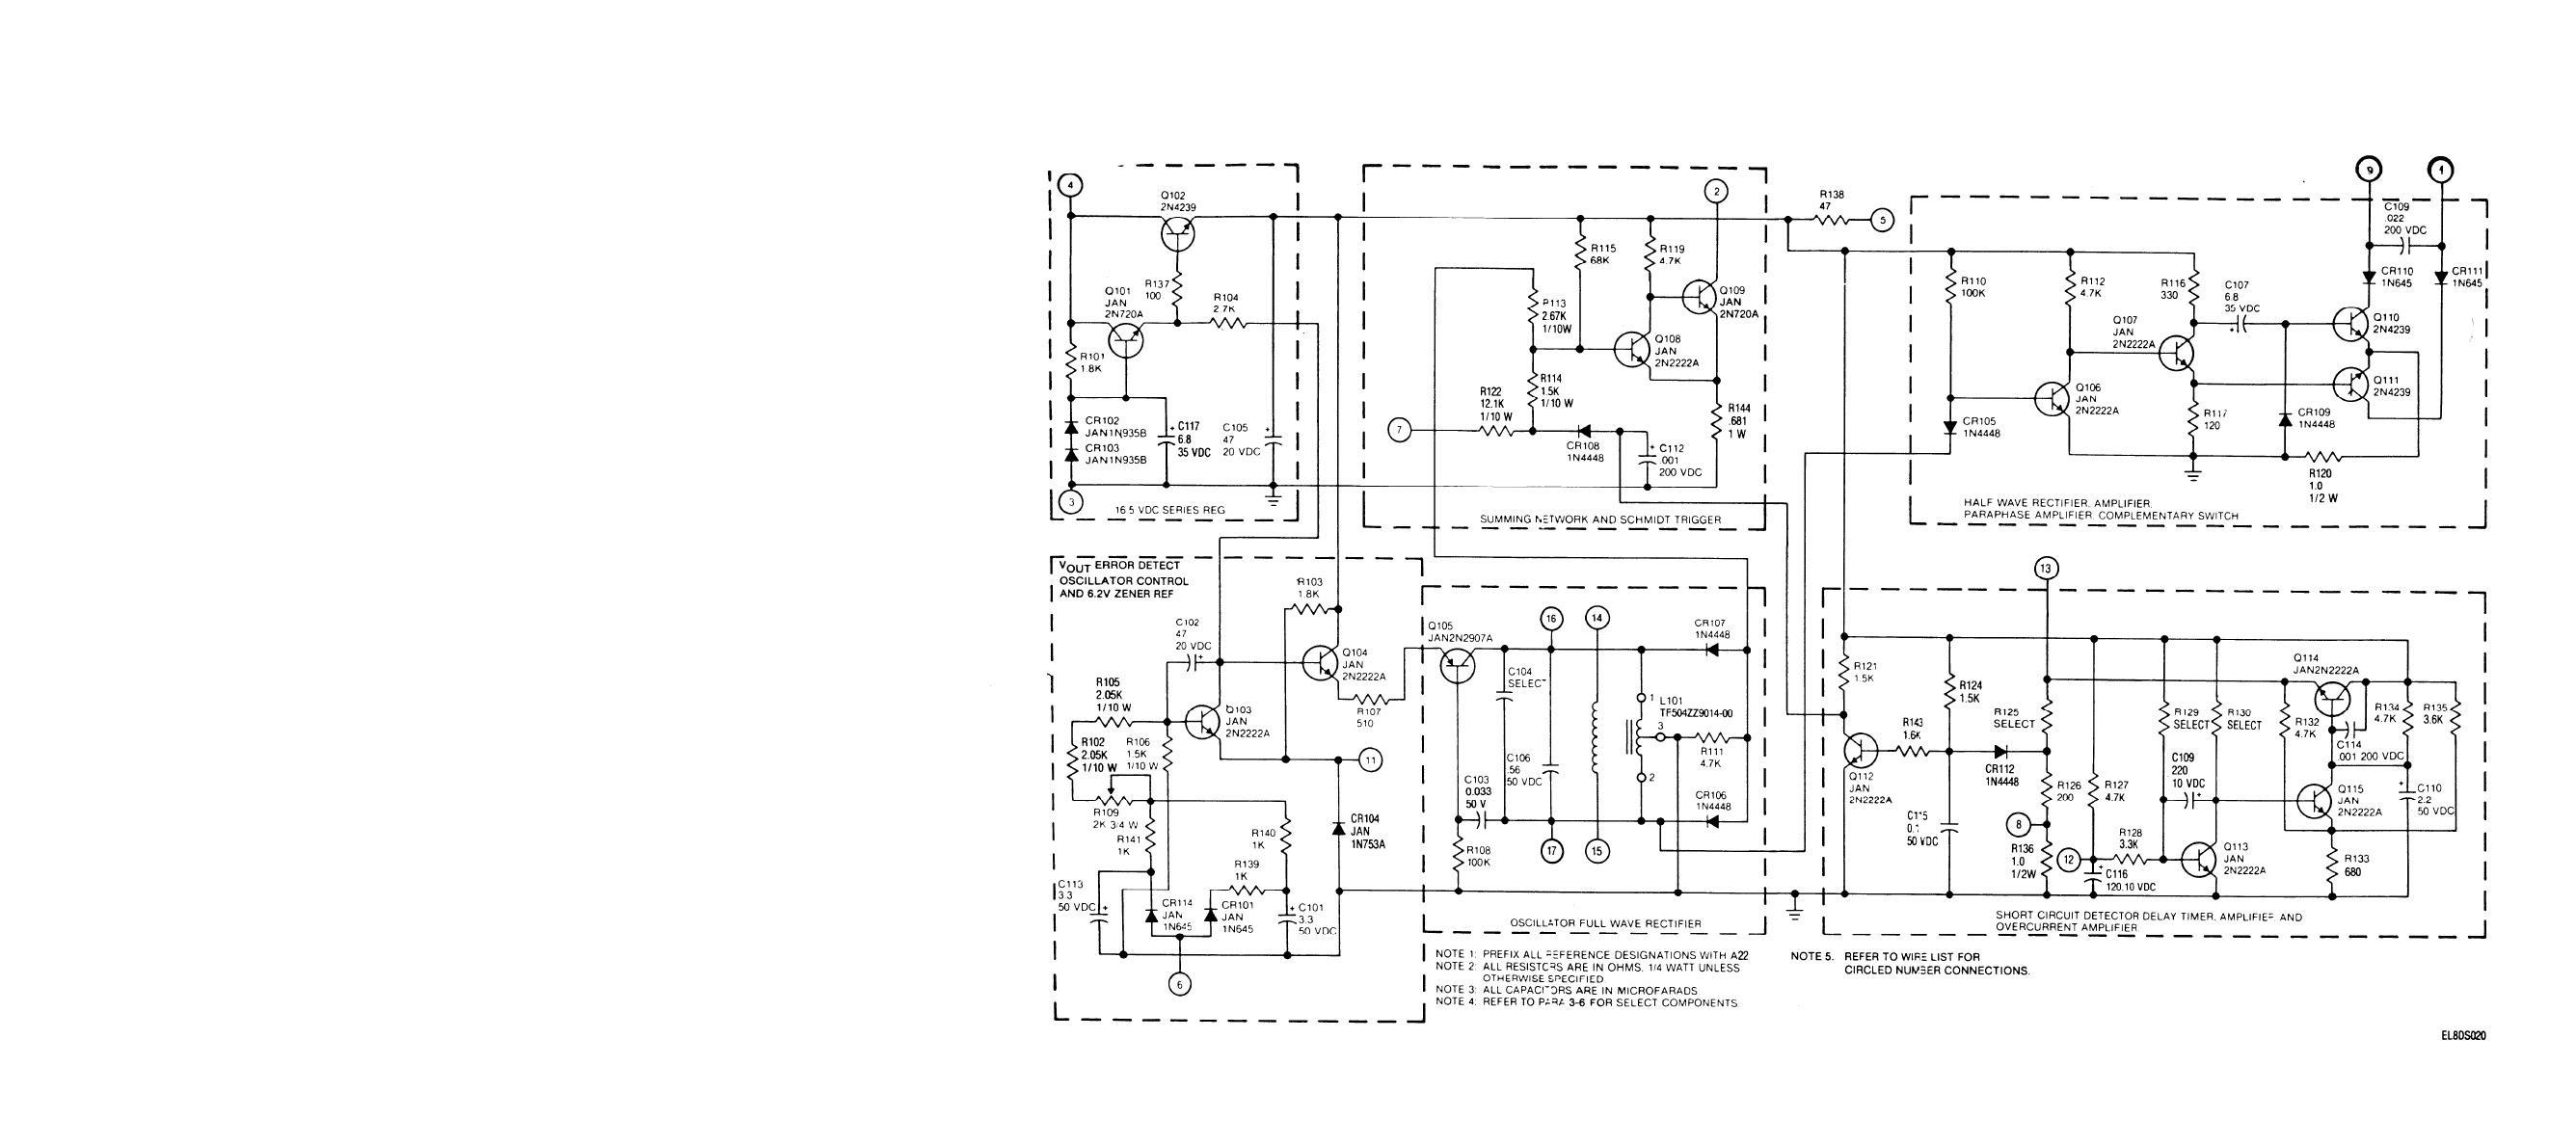 Inverter Schematic Diagram 12vdc 220vac Hp Photosmart Printer